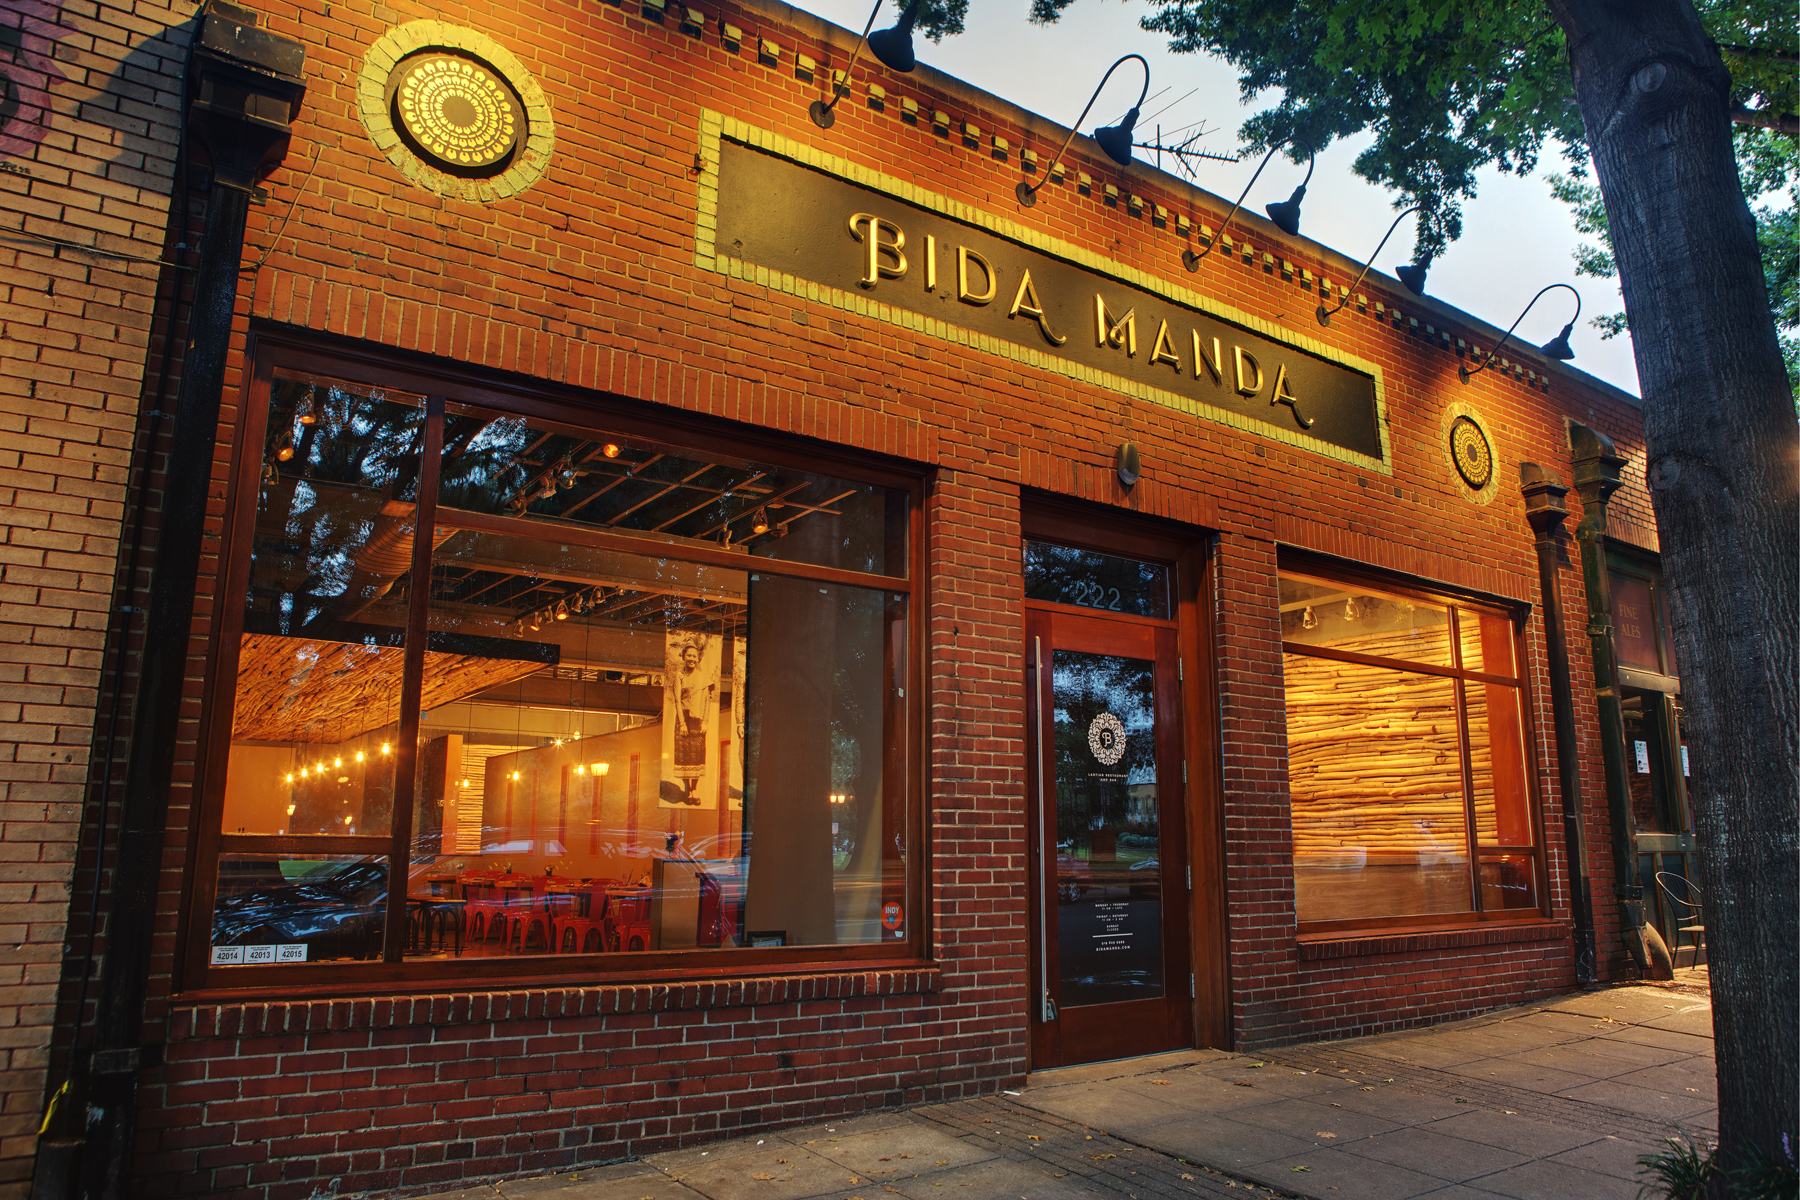 Interior, food, and principal photos of Bida Manda Laotian Restaurant and Bar in Raleigh NC. Owner Vansana Nolintha